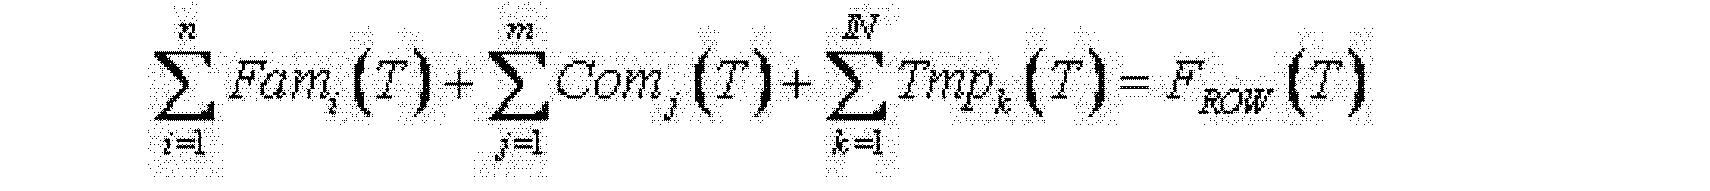 Figure CN102842097AD00202